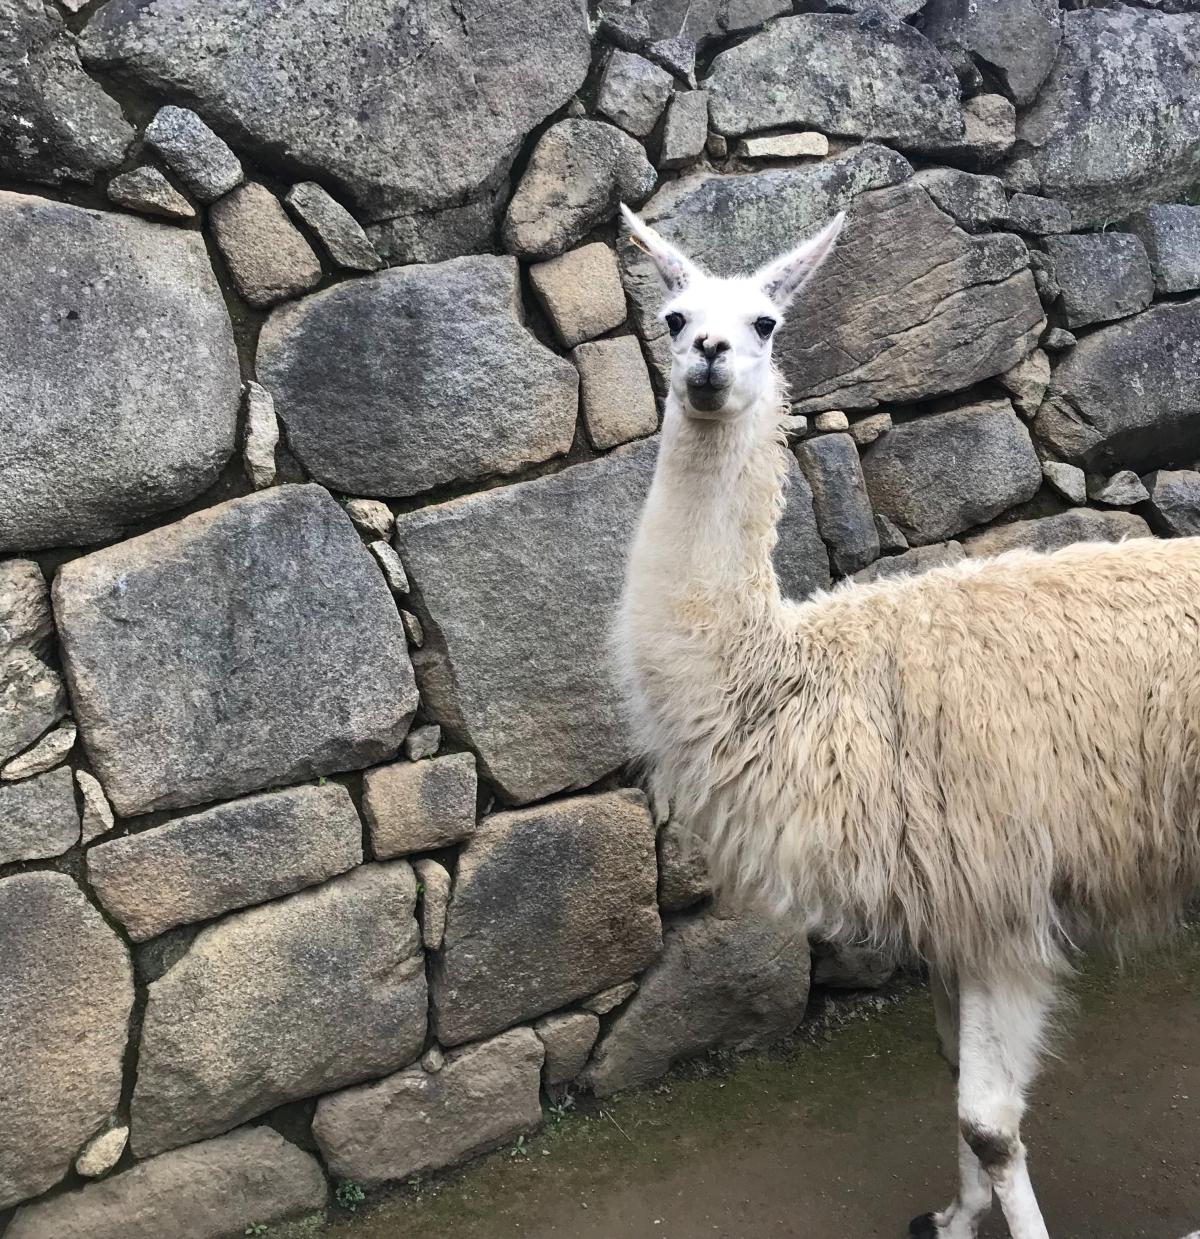 Image Description: Photo of a white llama against a grey stone background at Machu Picchu